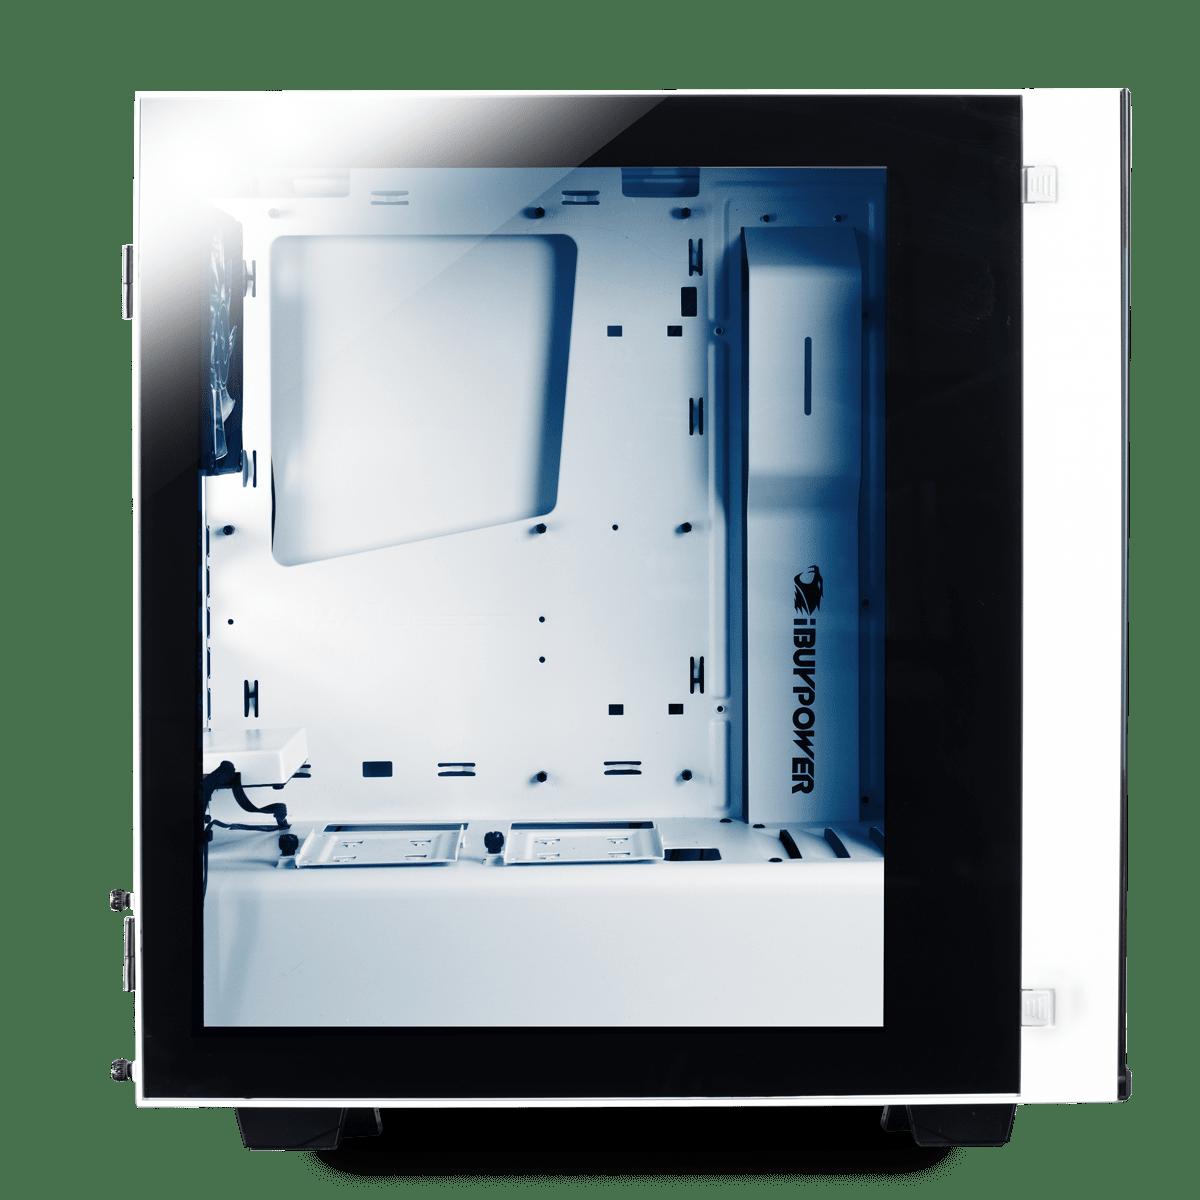 03-snowblind-element-case-side-1200-2